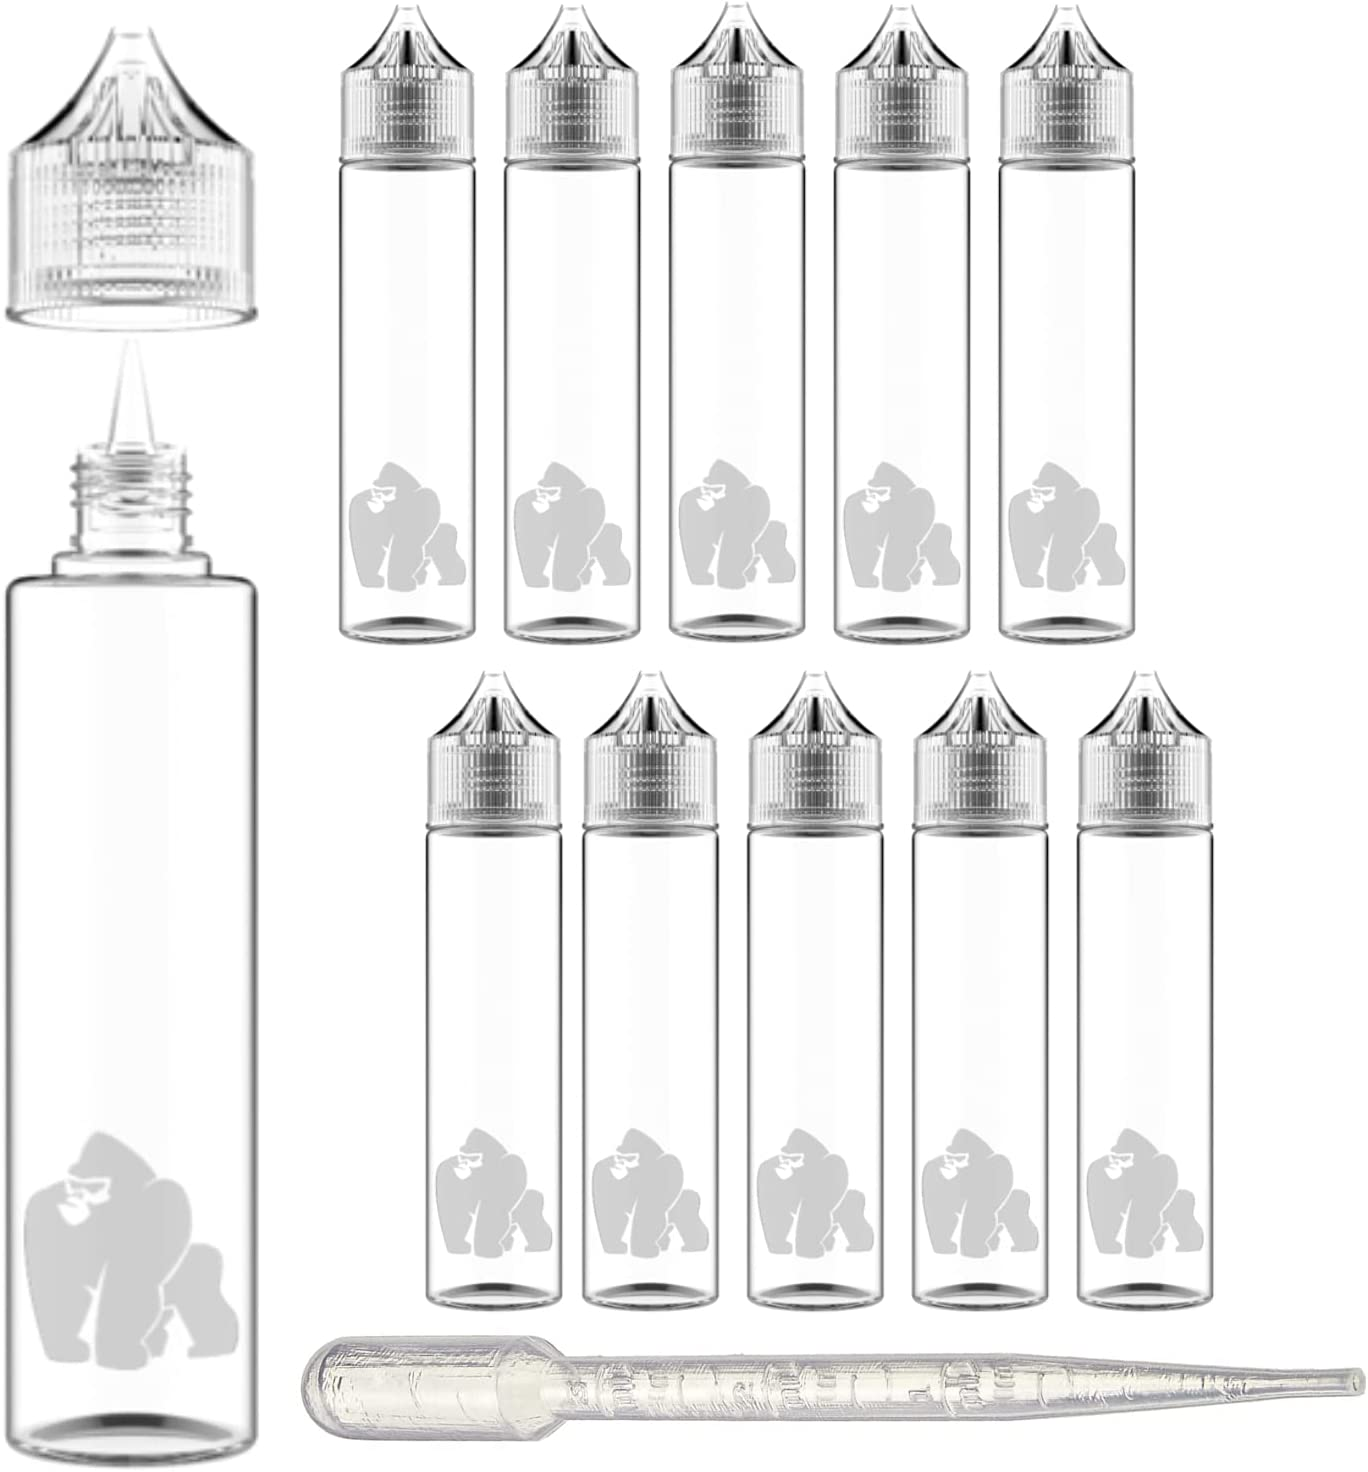 Chubby Gorilla LDPE Award PET Plastic Unicorn 10 25% OFF Squeeze Bottle 60ml